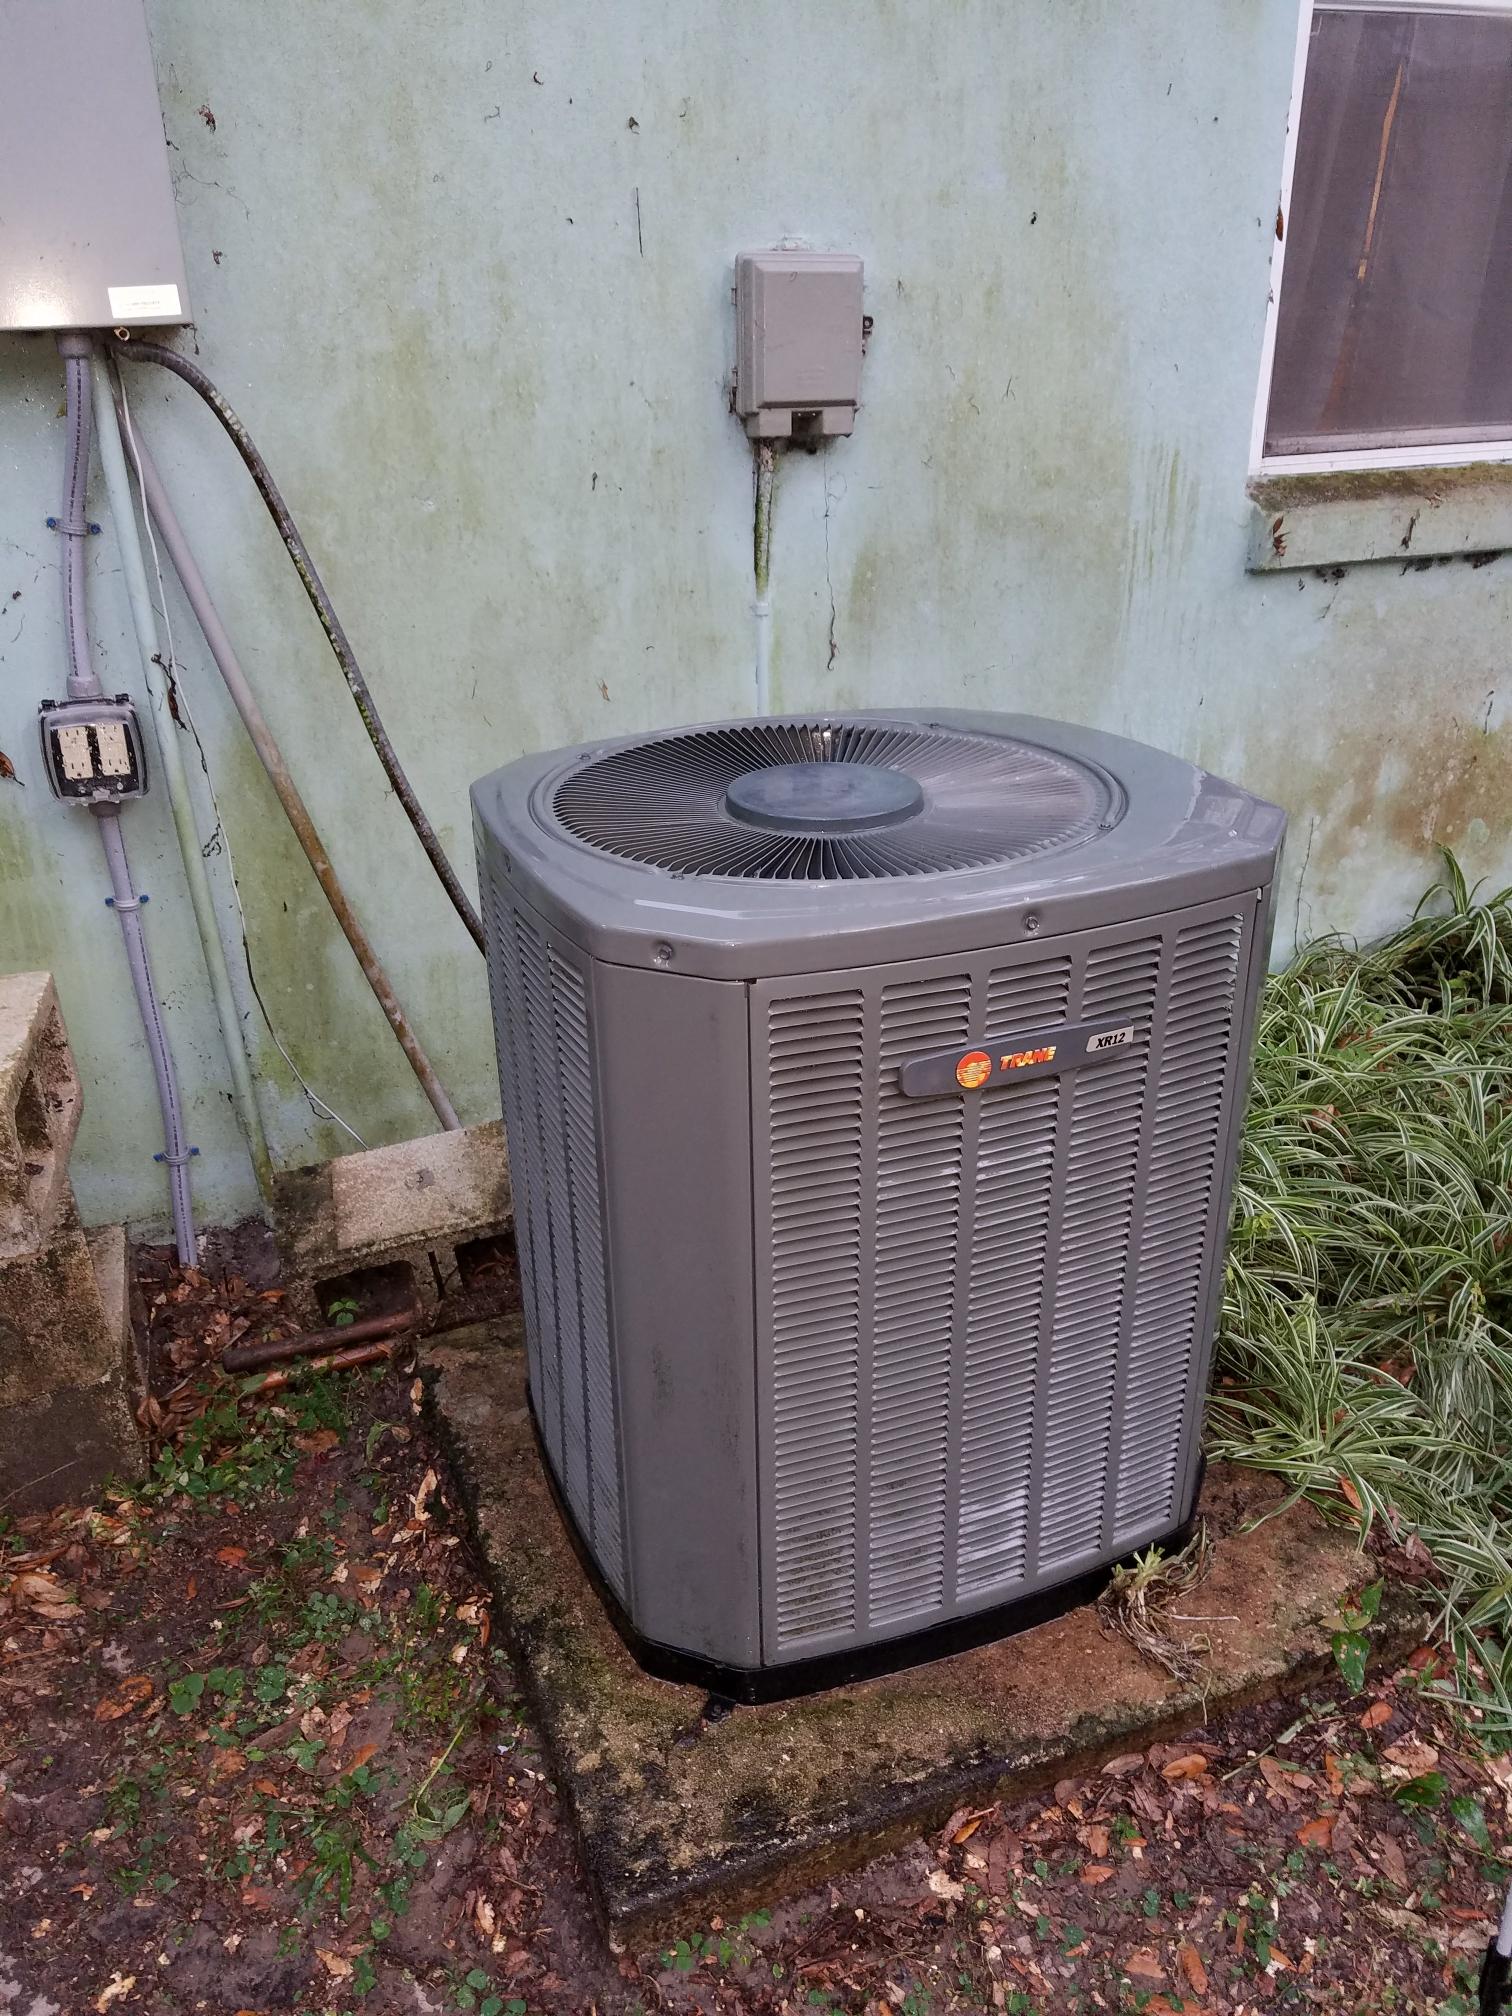 Florahome, FL - Maintenance on trane